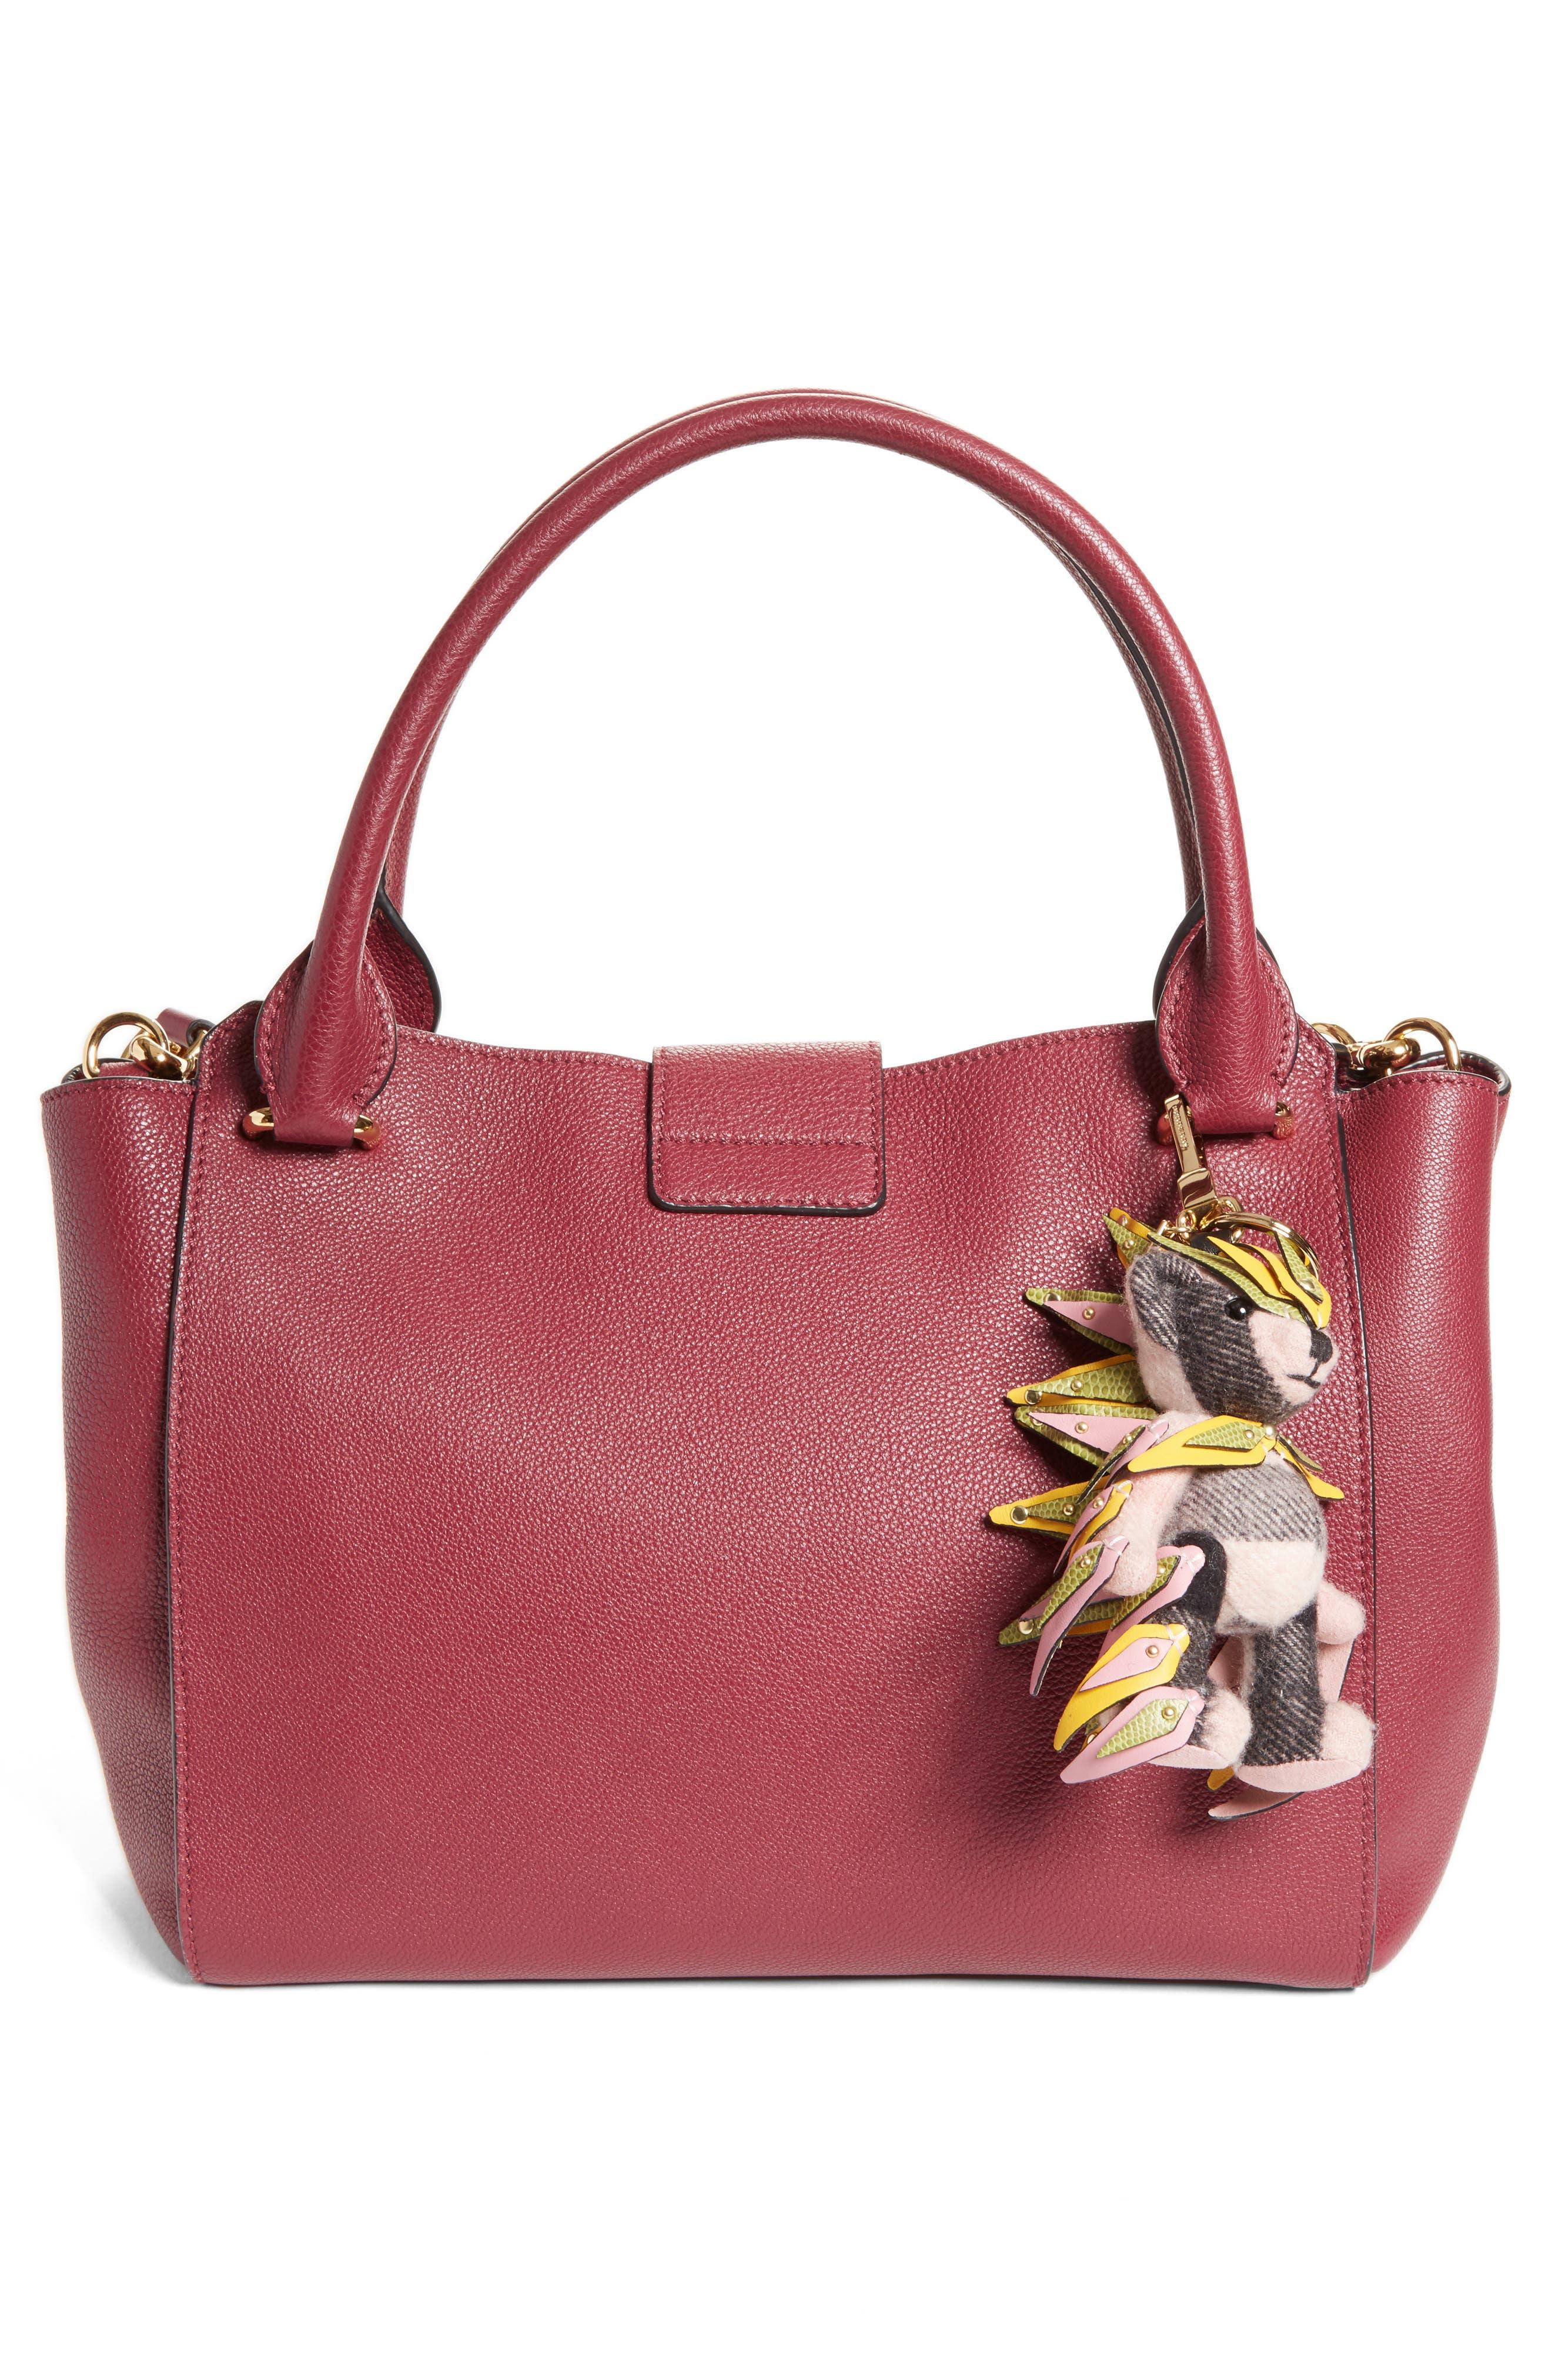 Thomas Bear Cashmere Bag Charm,                             Alternate thumbnail 2, color,                             531